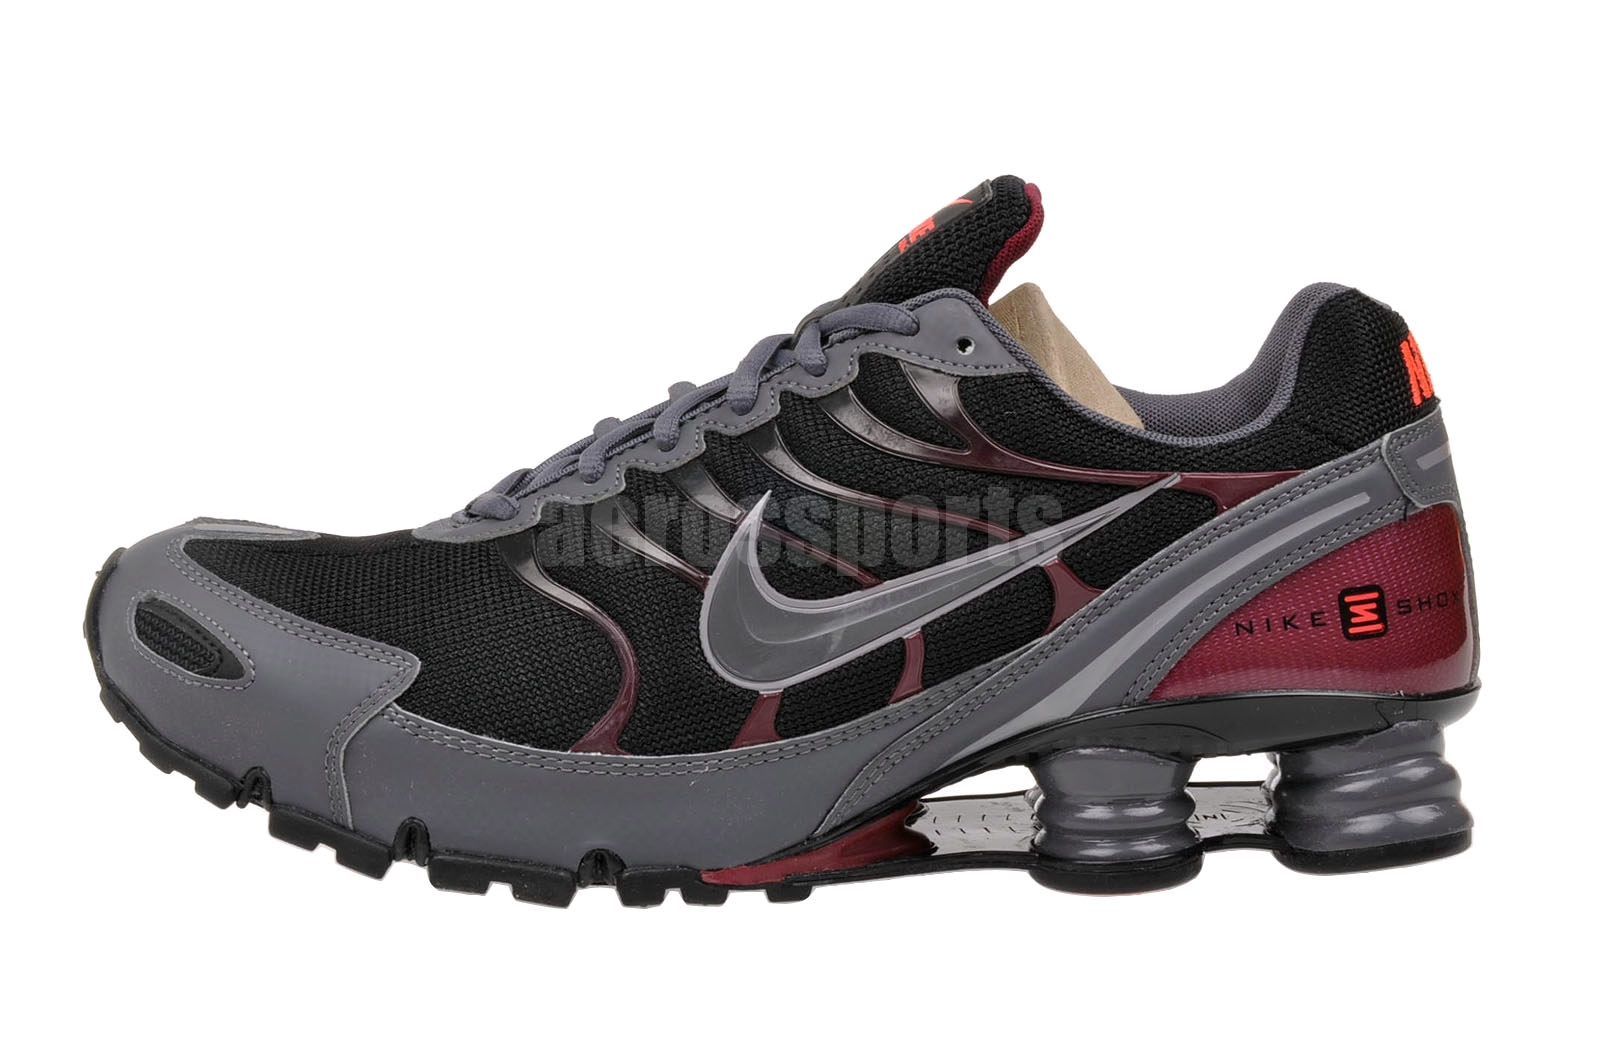 Nike Lebron 12 For Infants In California Nike Shoes Huarache Galaxy ... 1b35822d8